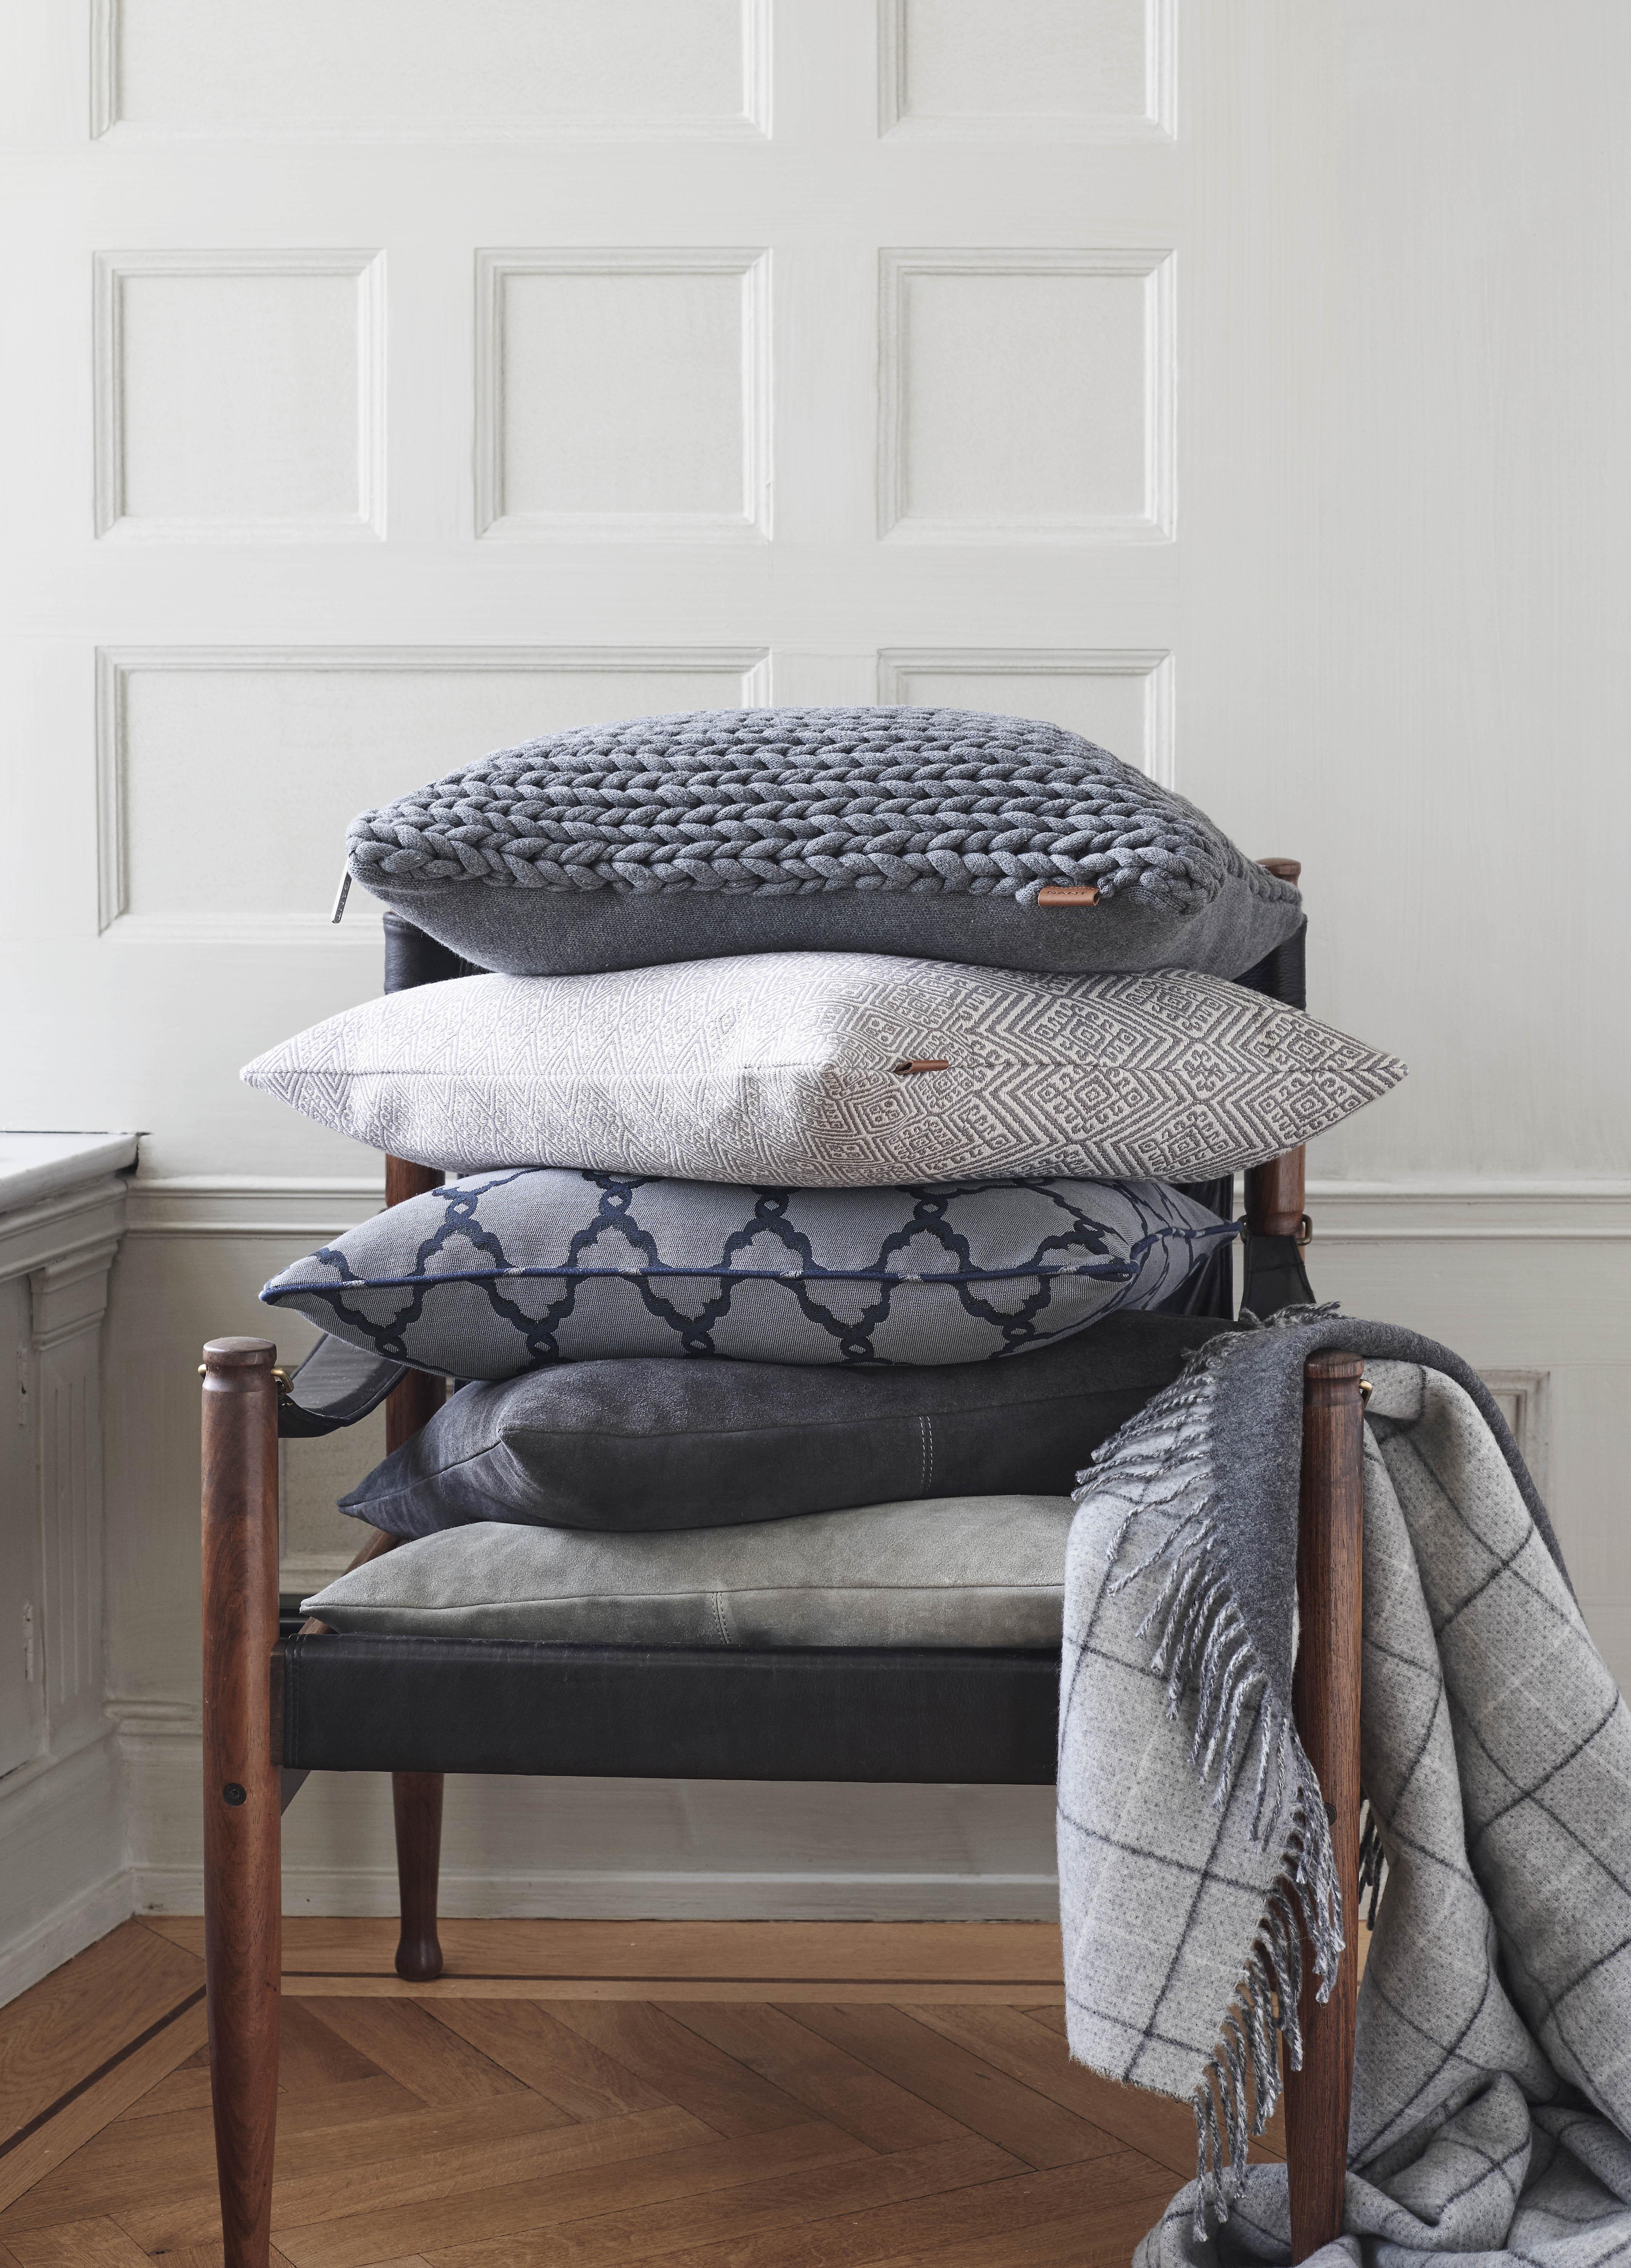 gant home levererar daniella dansson metro mode. Black Bedroom Furniture Sets. Home Design Ideas